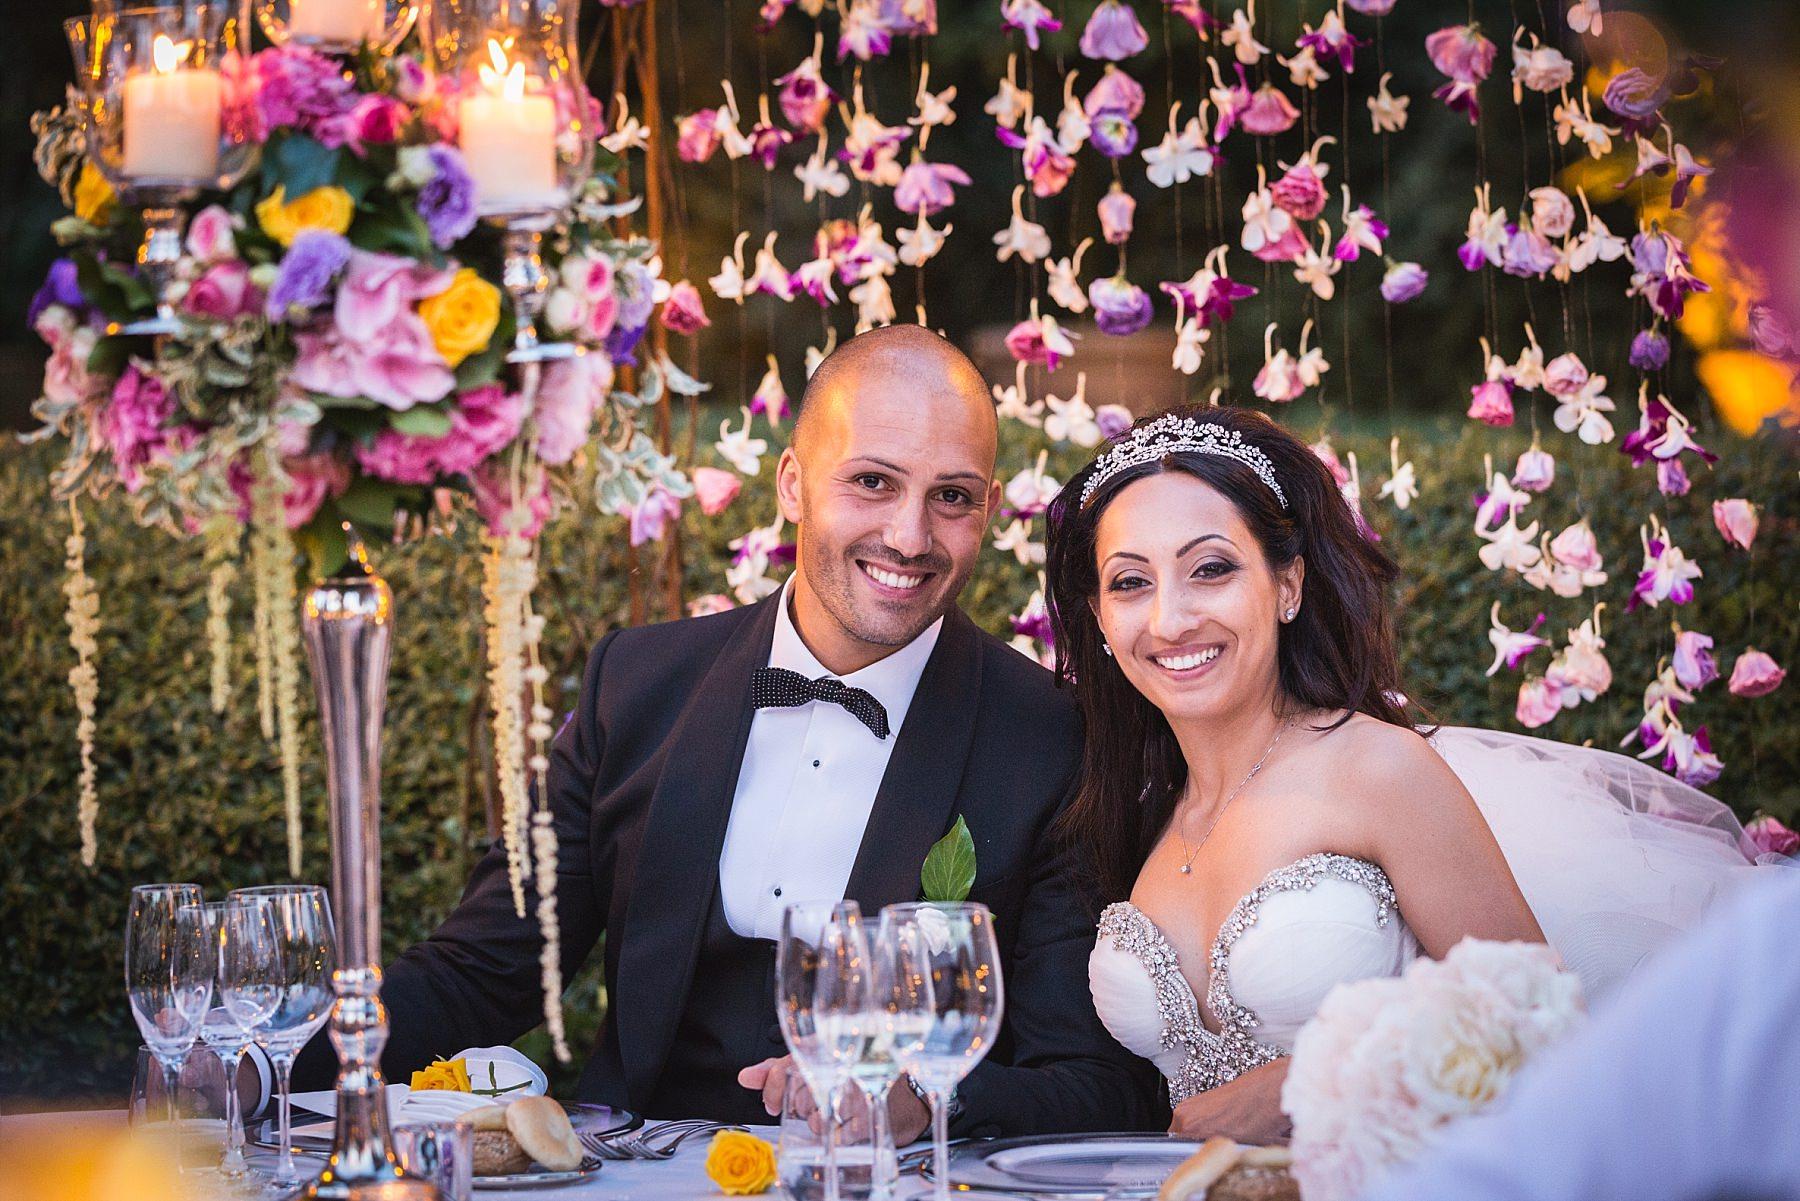 Fotografie di Matrimonio in Toscana a Paterno